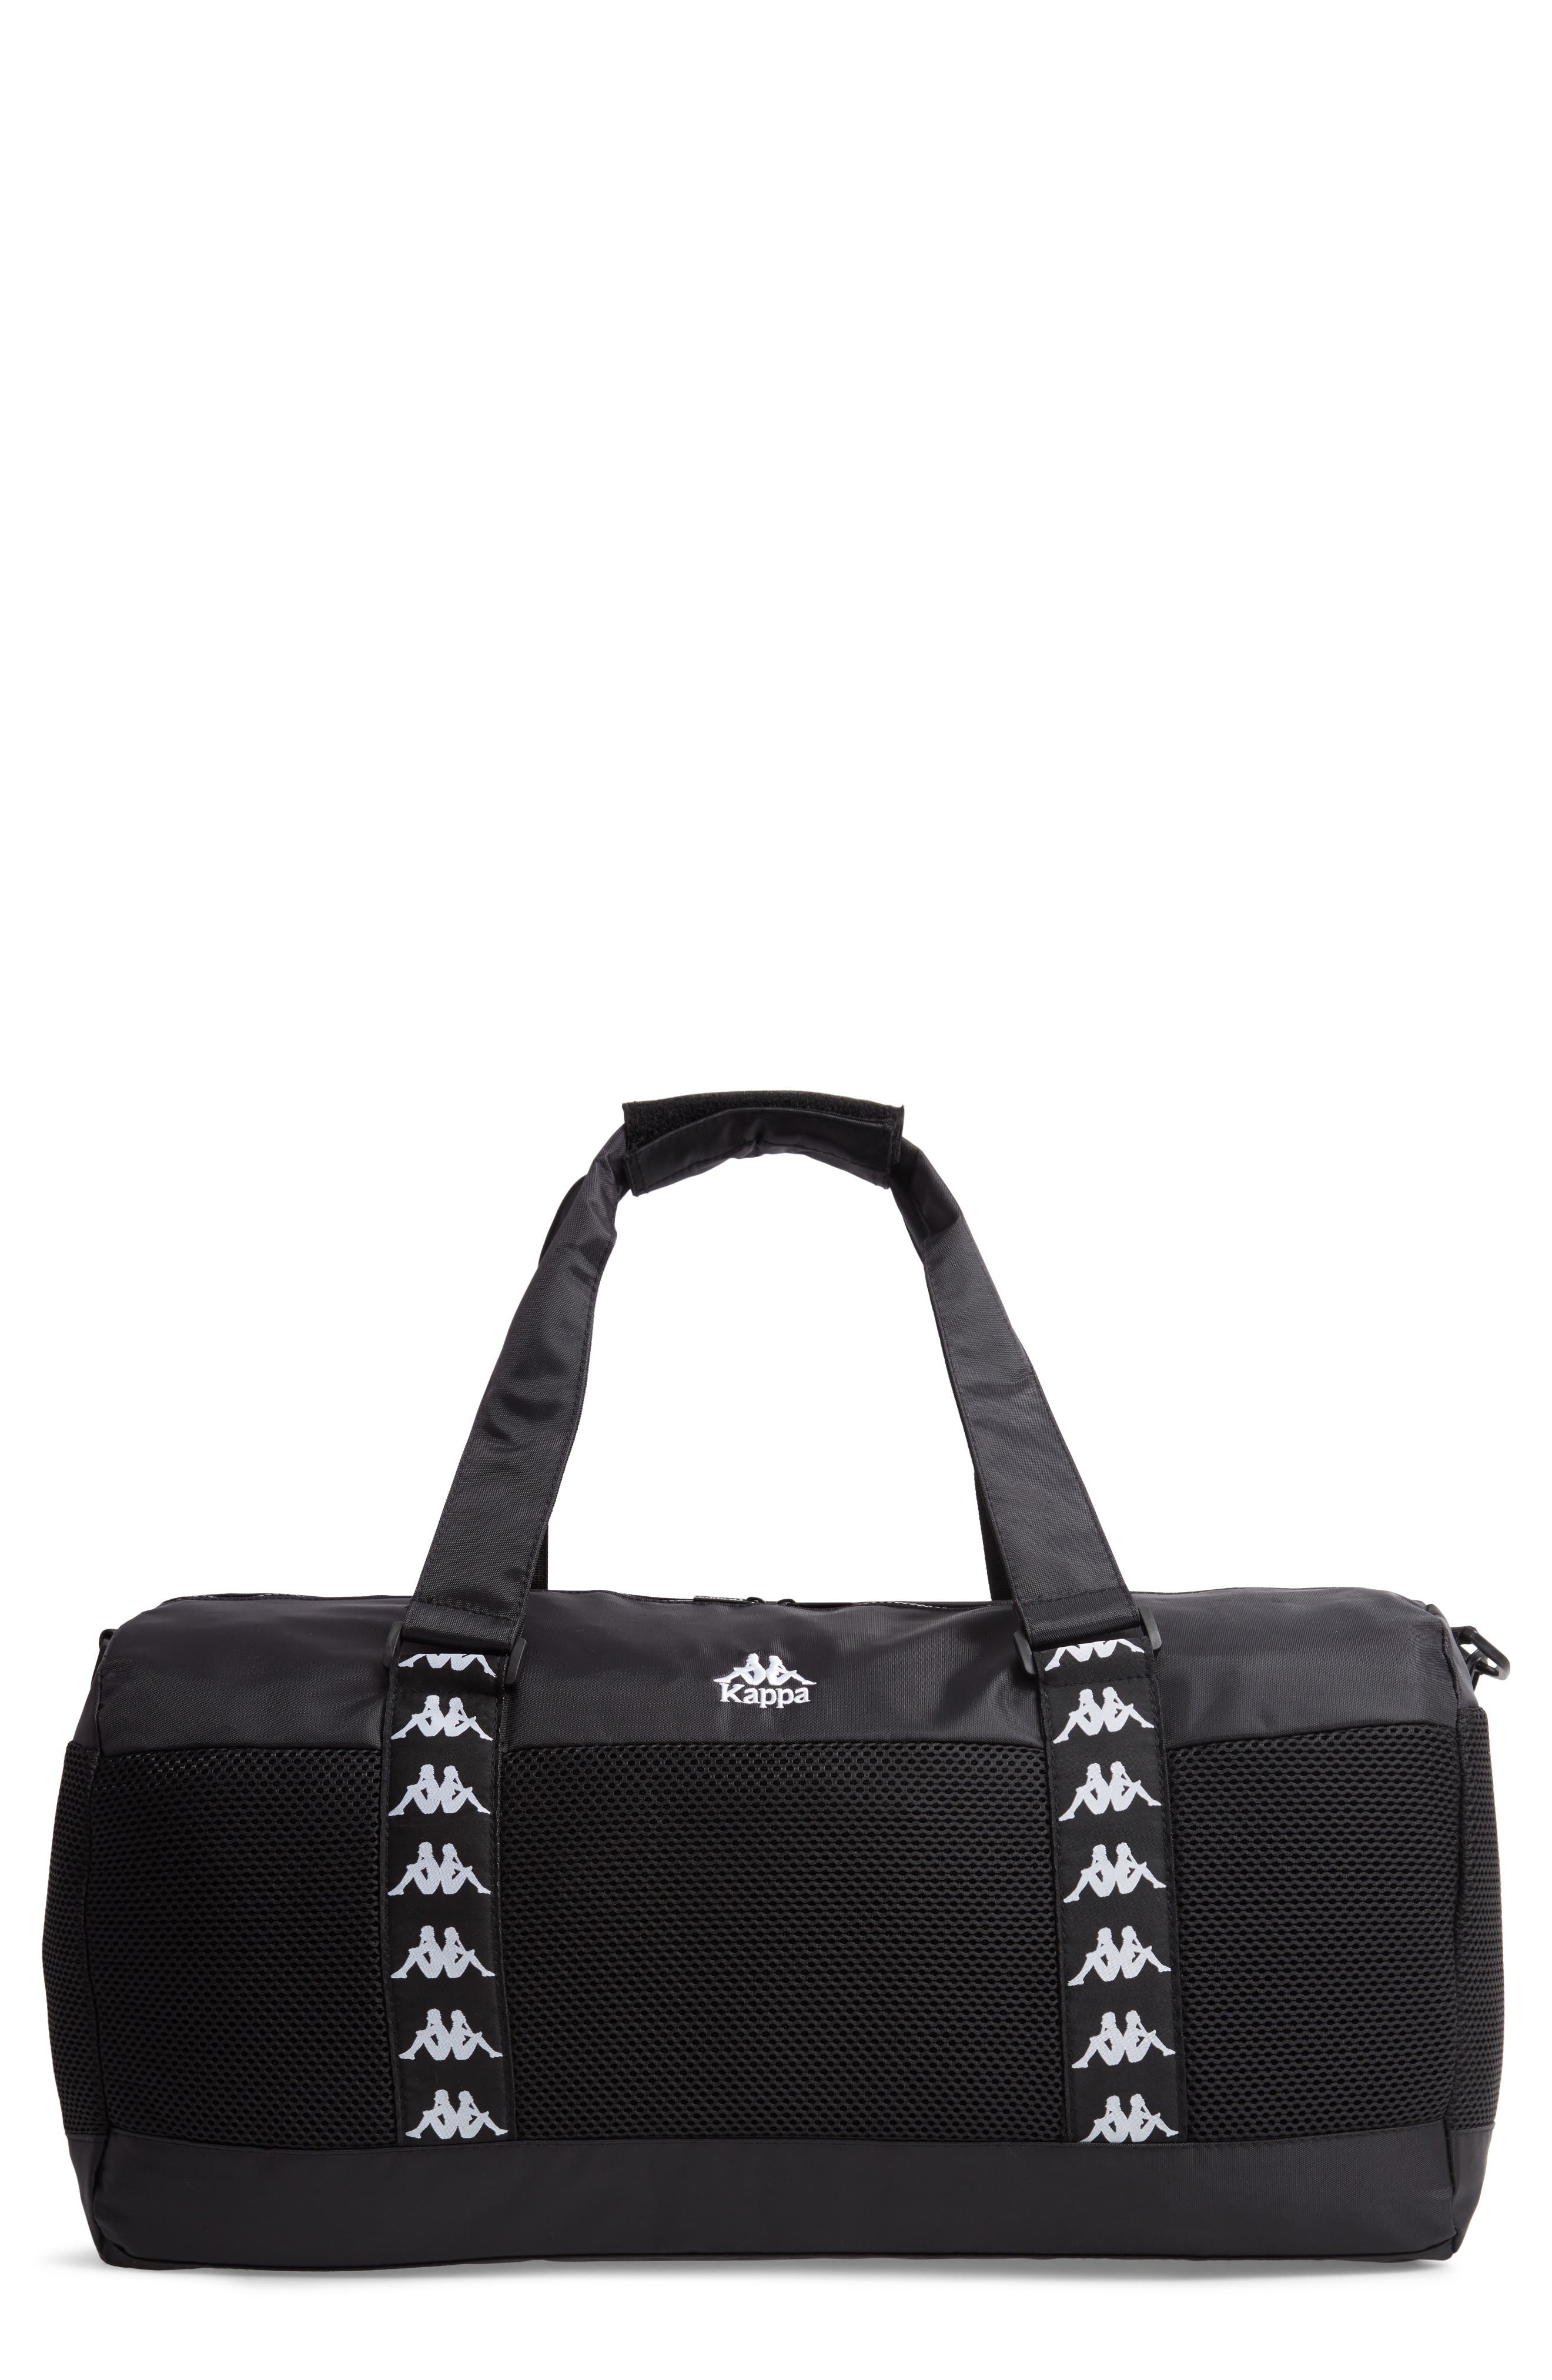 XL Athletic Duffel Bag,                             Main thumbnail 1, color,                             BLACK-WHITE